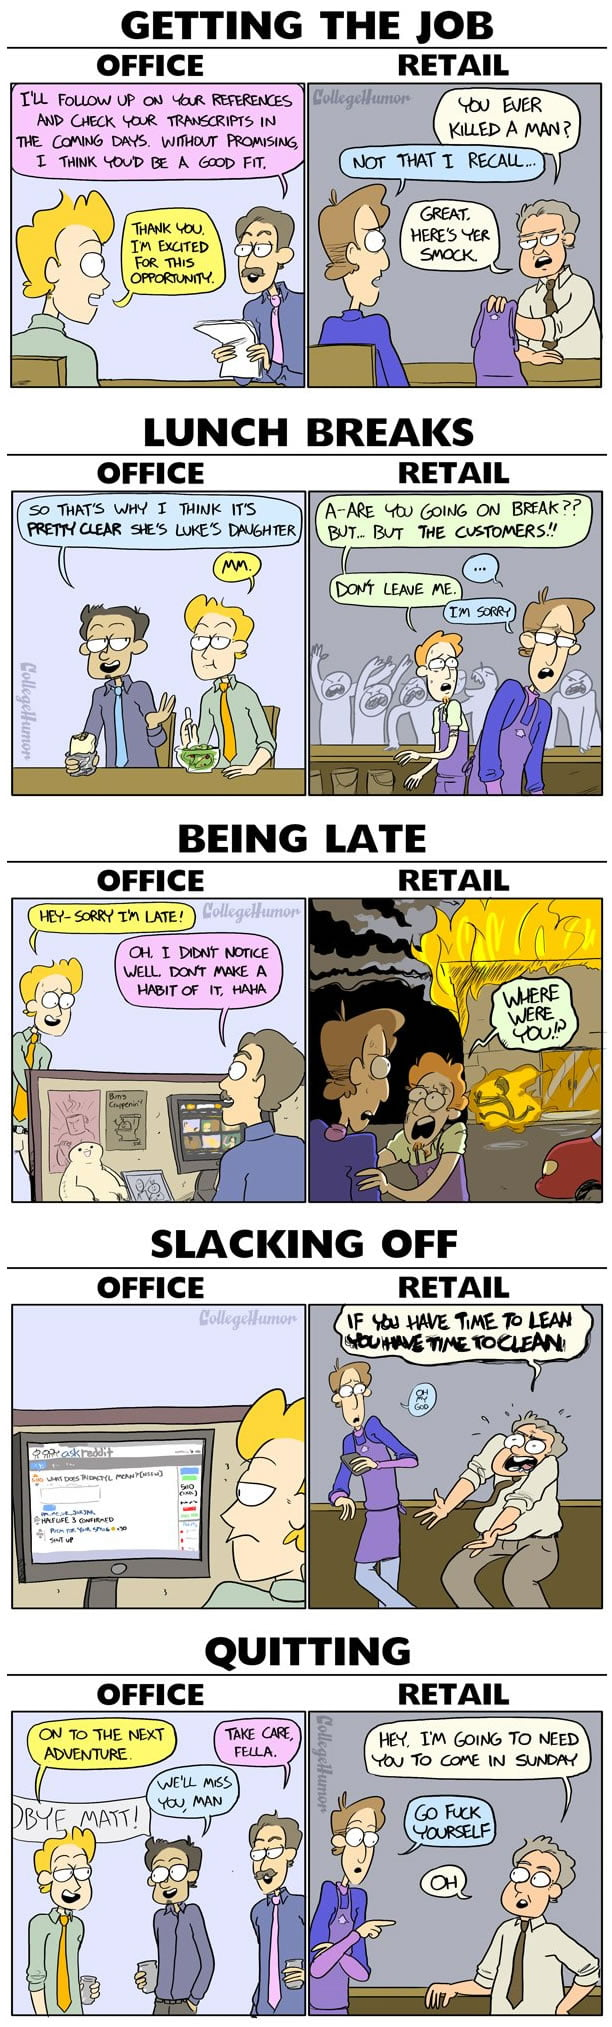 Office vs retail jobs